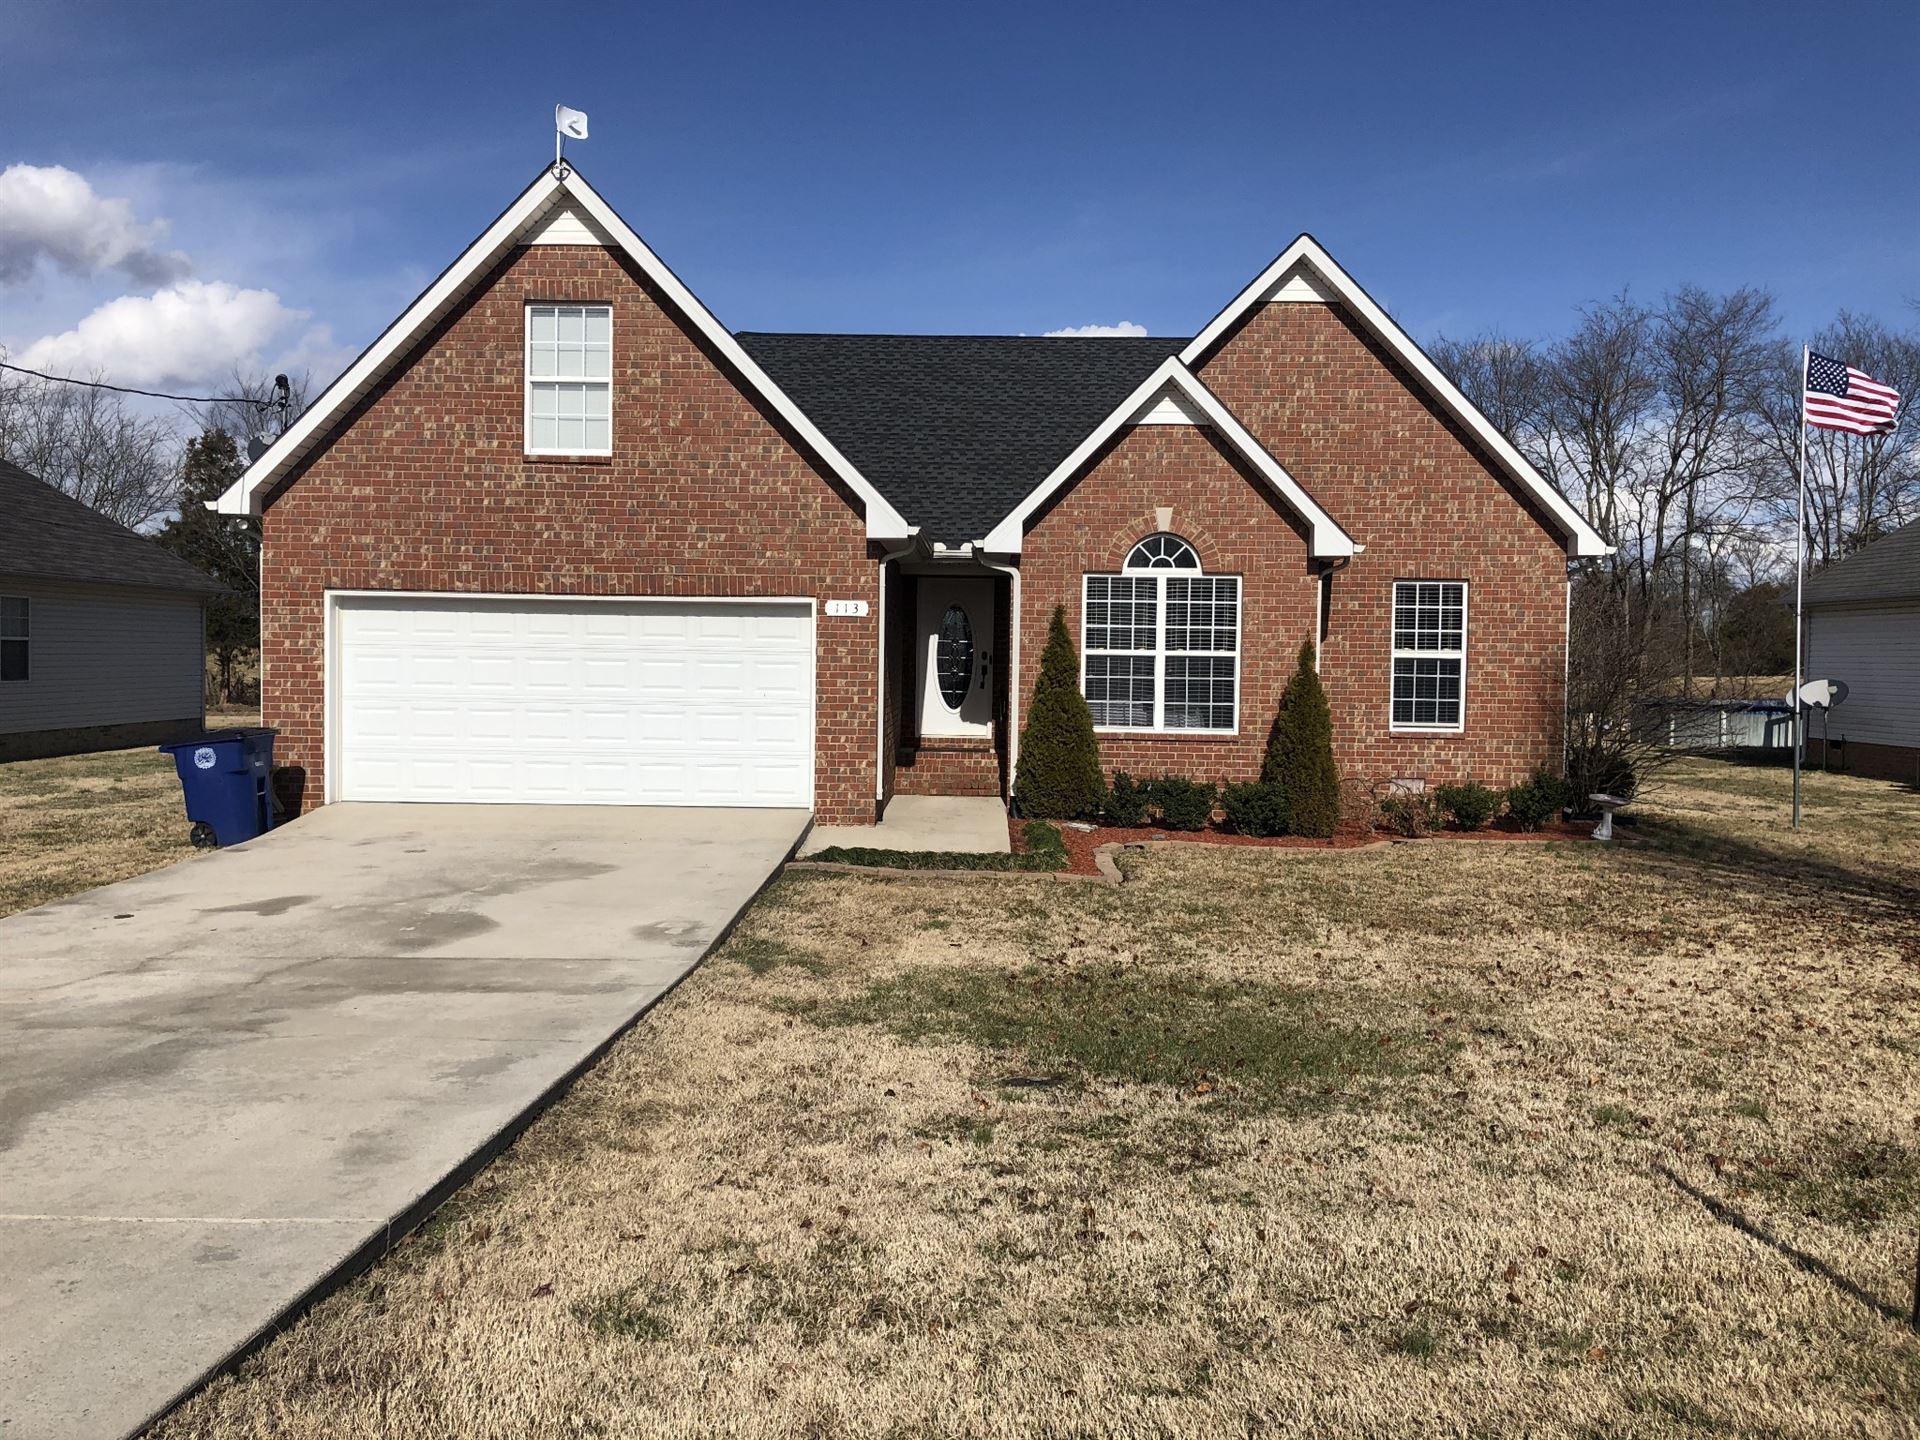 113 Raven Ct, Shelbyville, TN 37160 - MLS#: 2220619